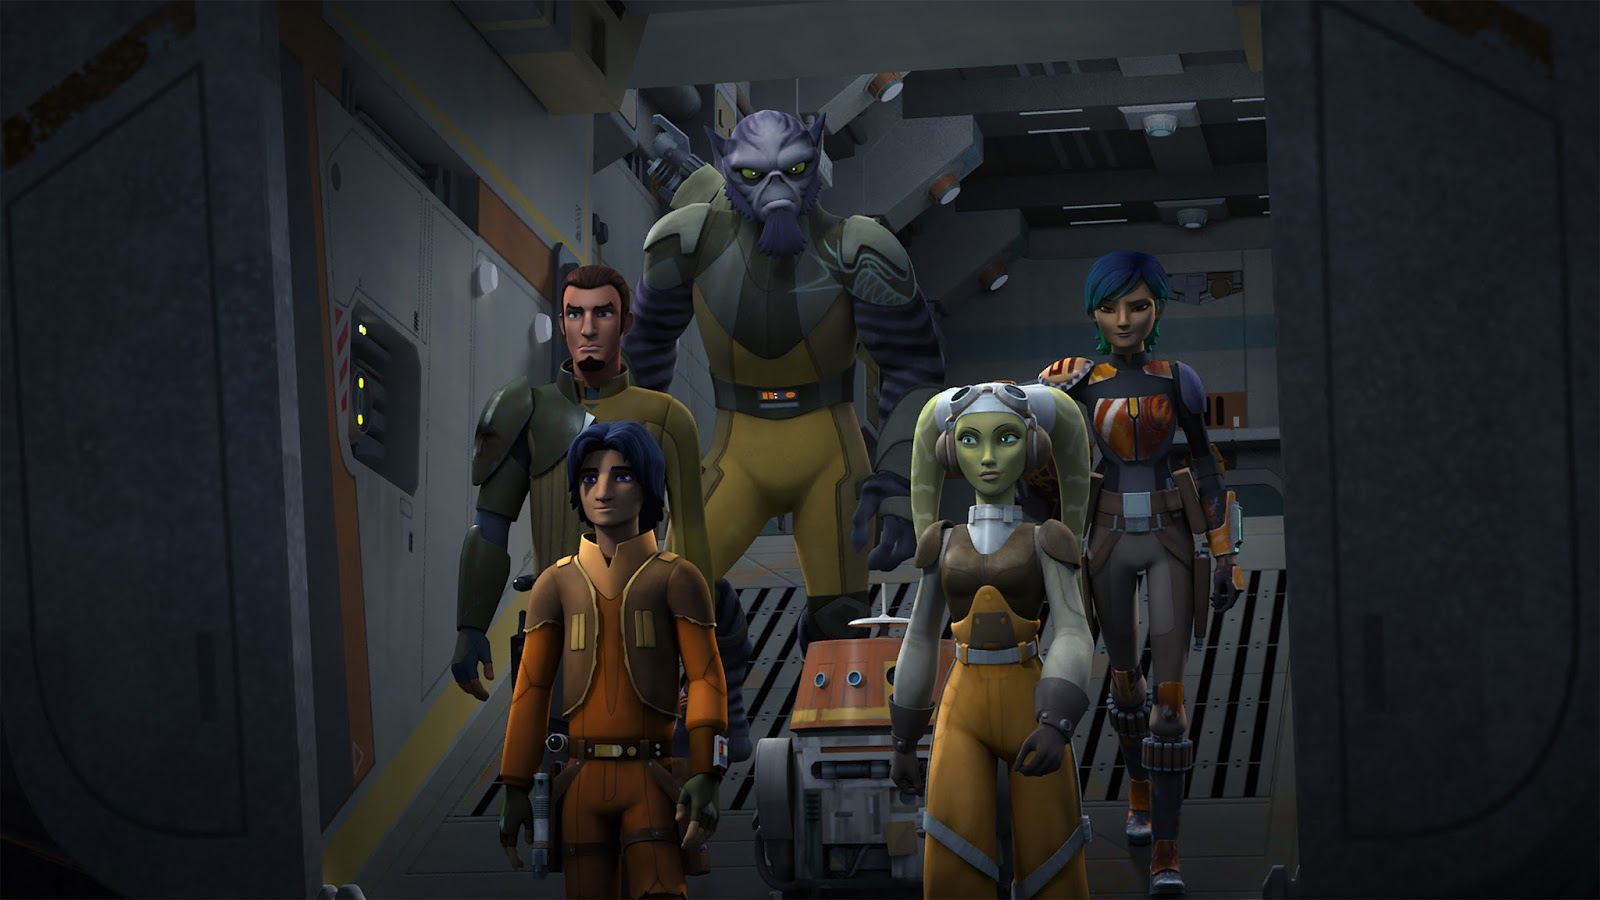 Star Wars Rebels Gets A Third Season